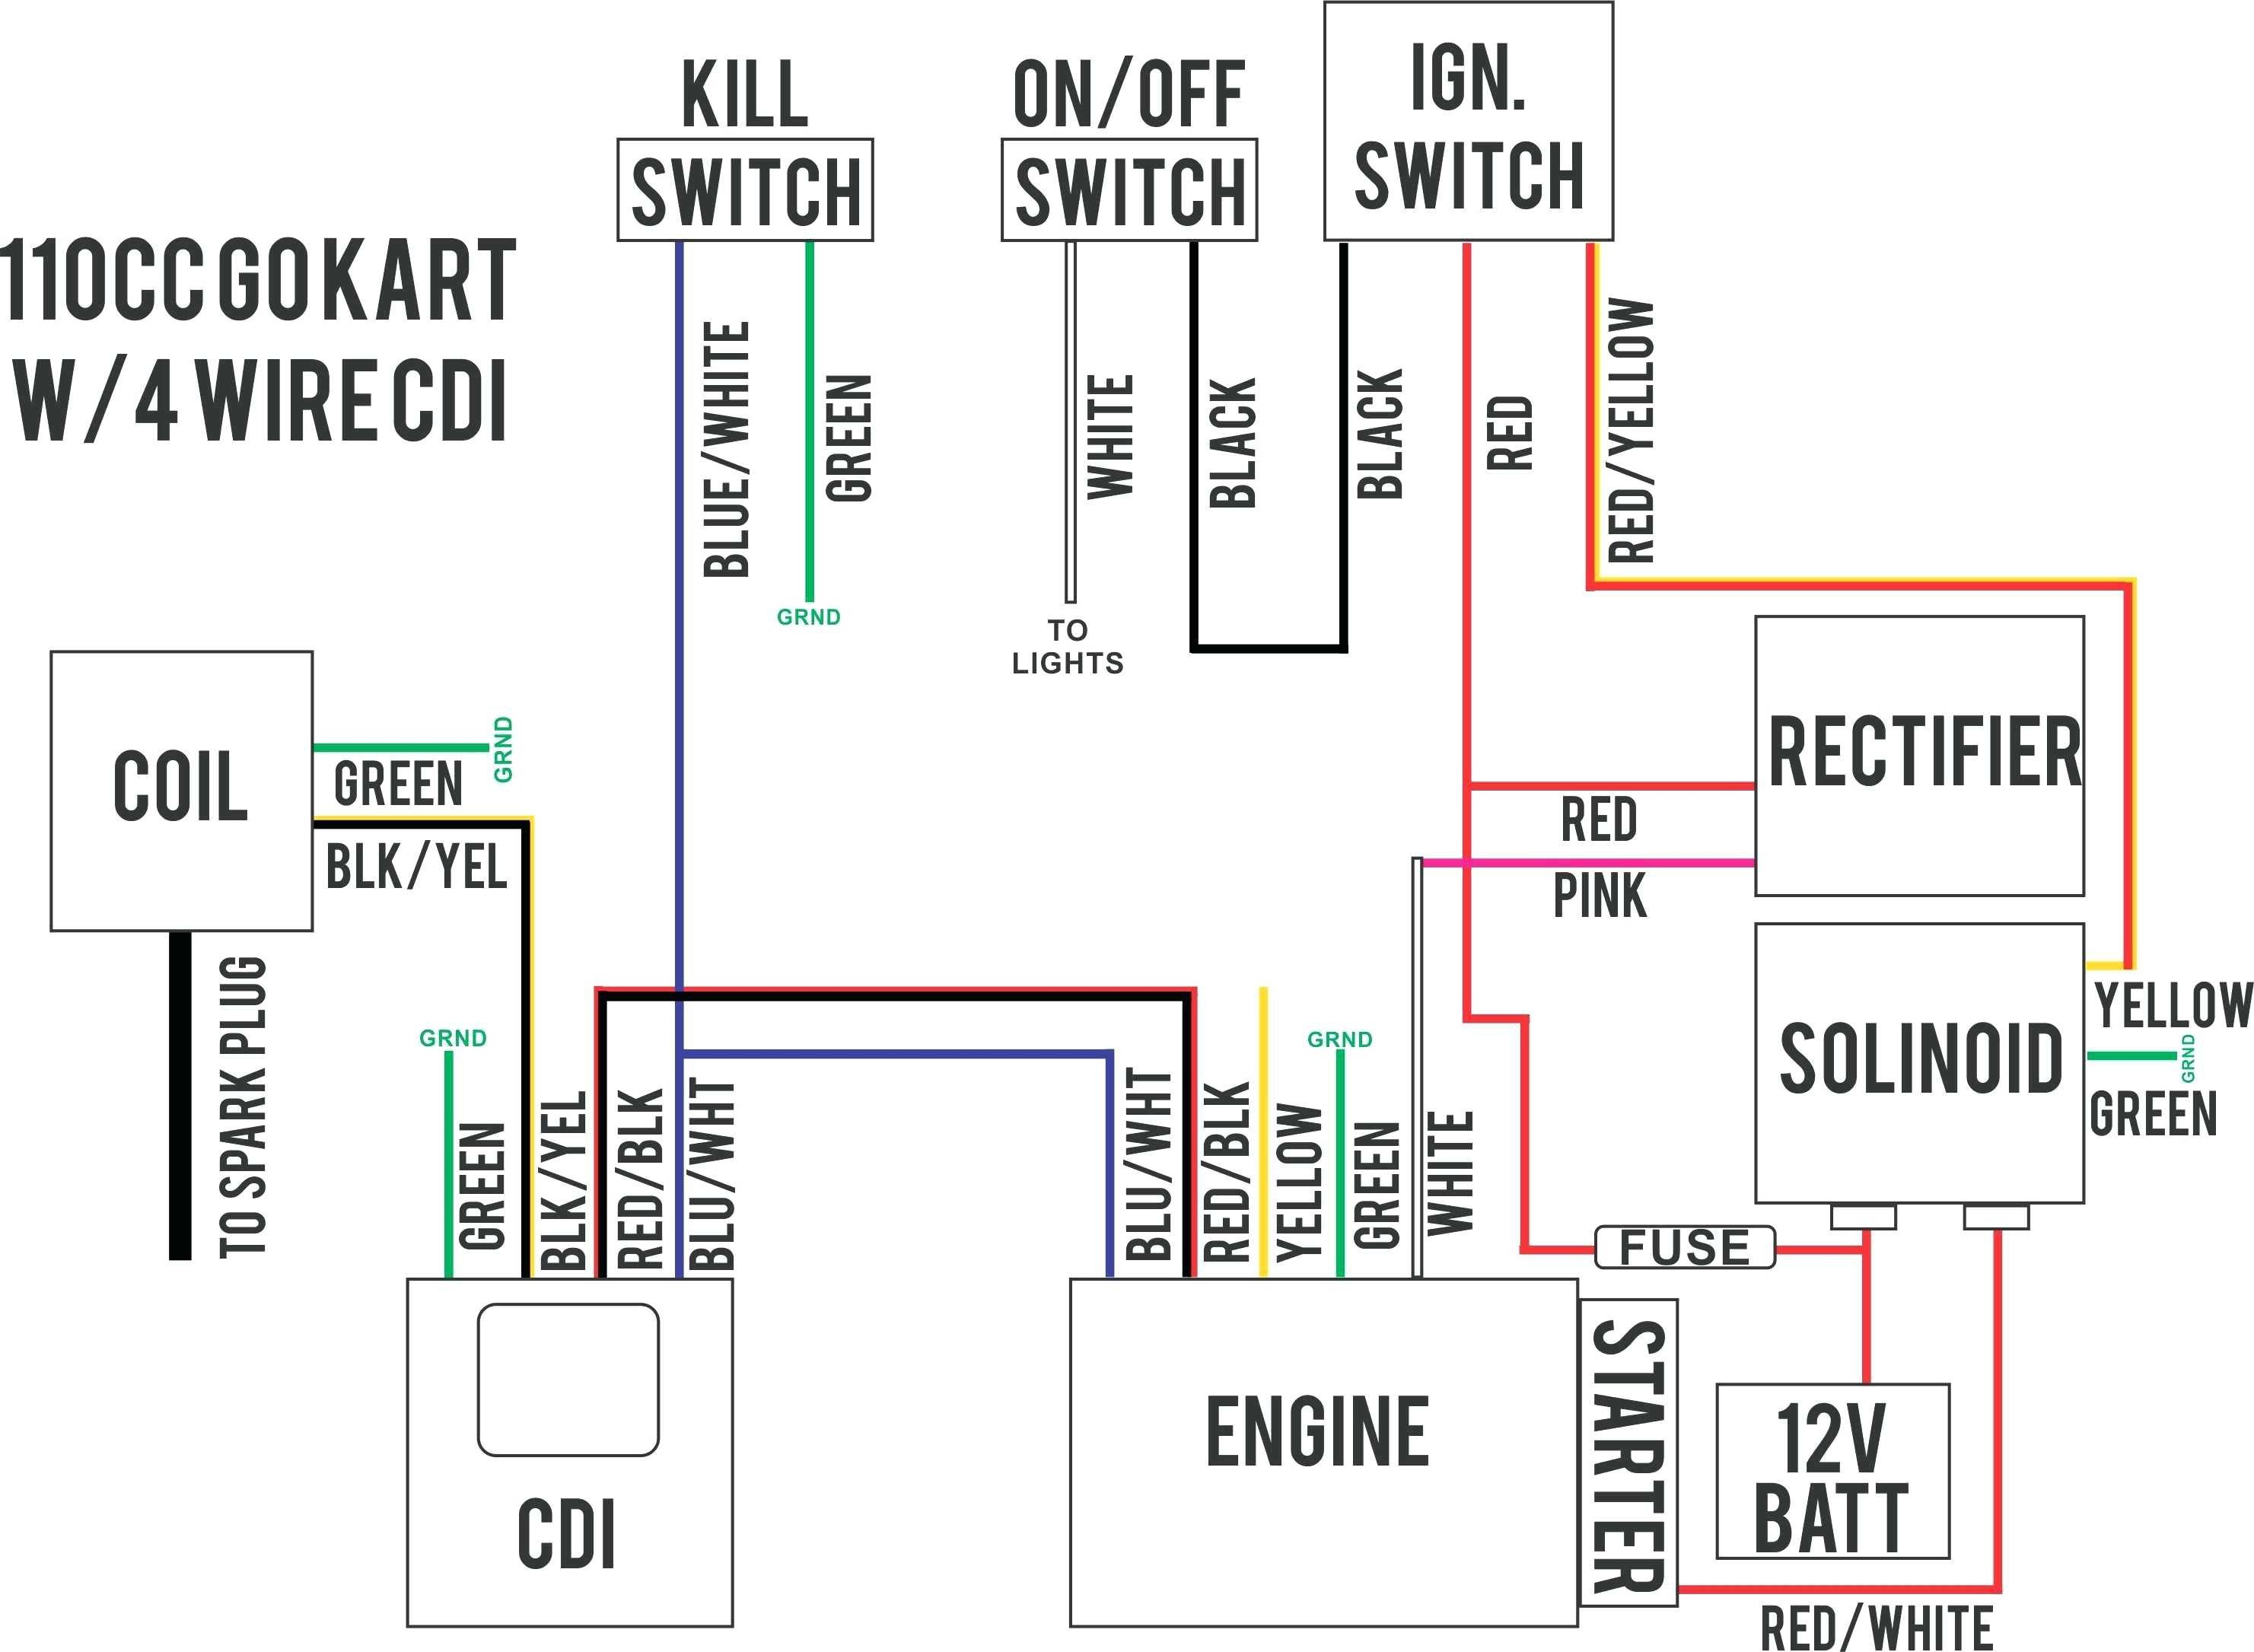 atv cdi wiring diagrams 1 chinese quad bike wiring diagram wire rh linxglobal co Kawalaski CDI